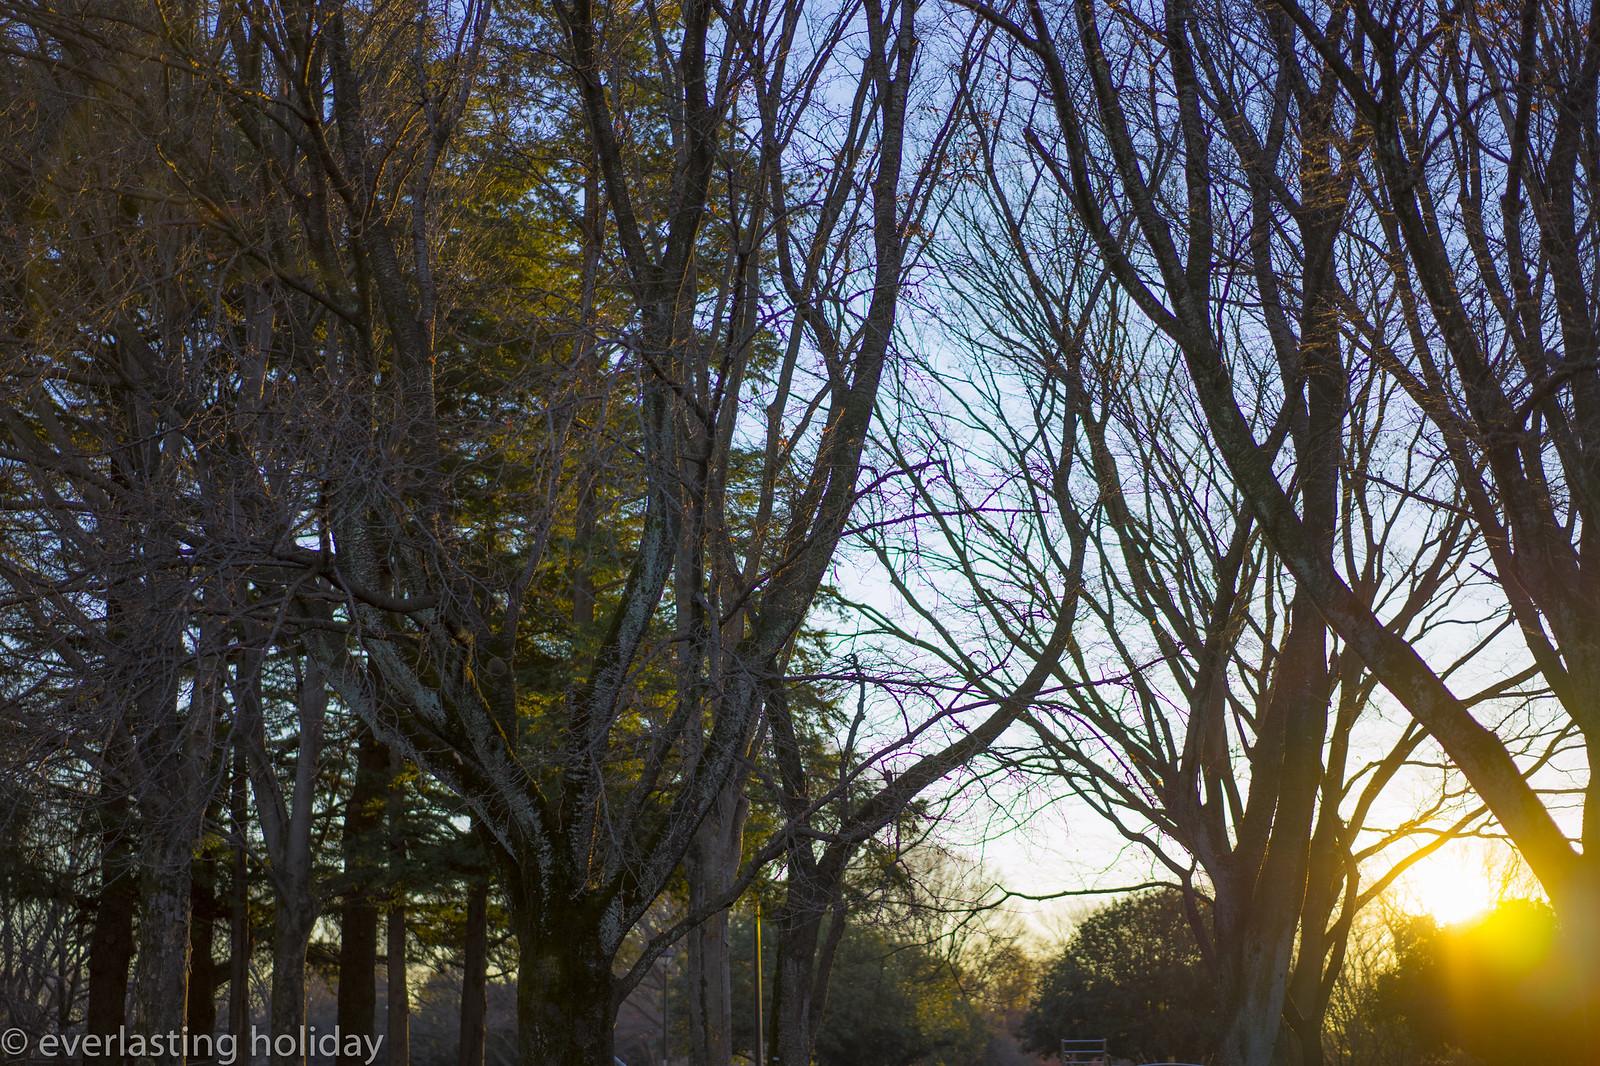 小金井公園 Koganei Park-0019